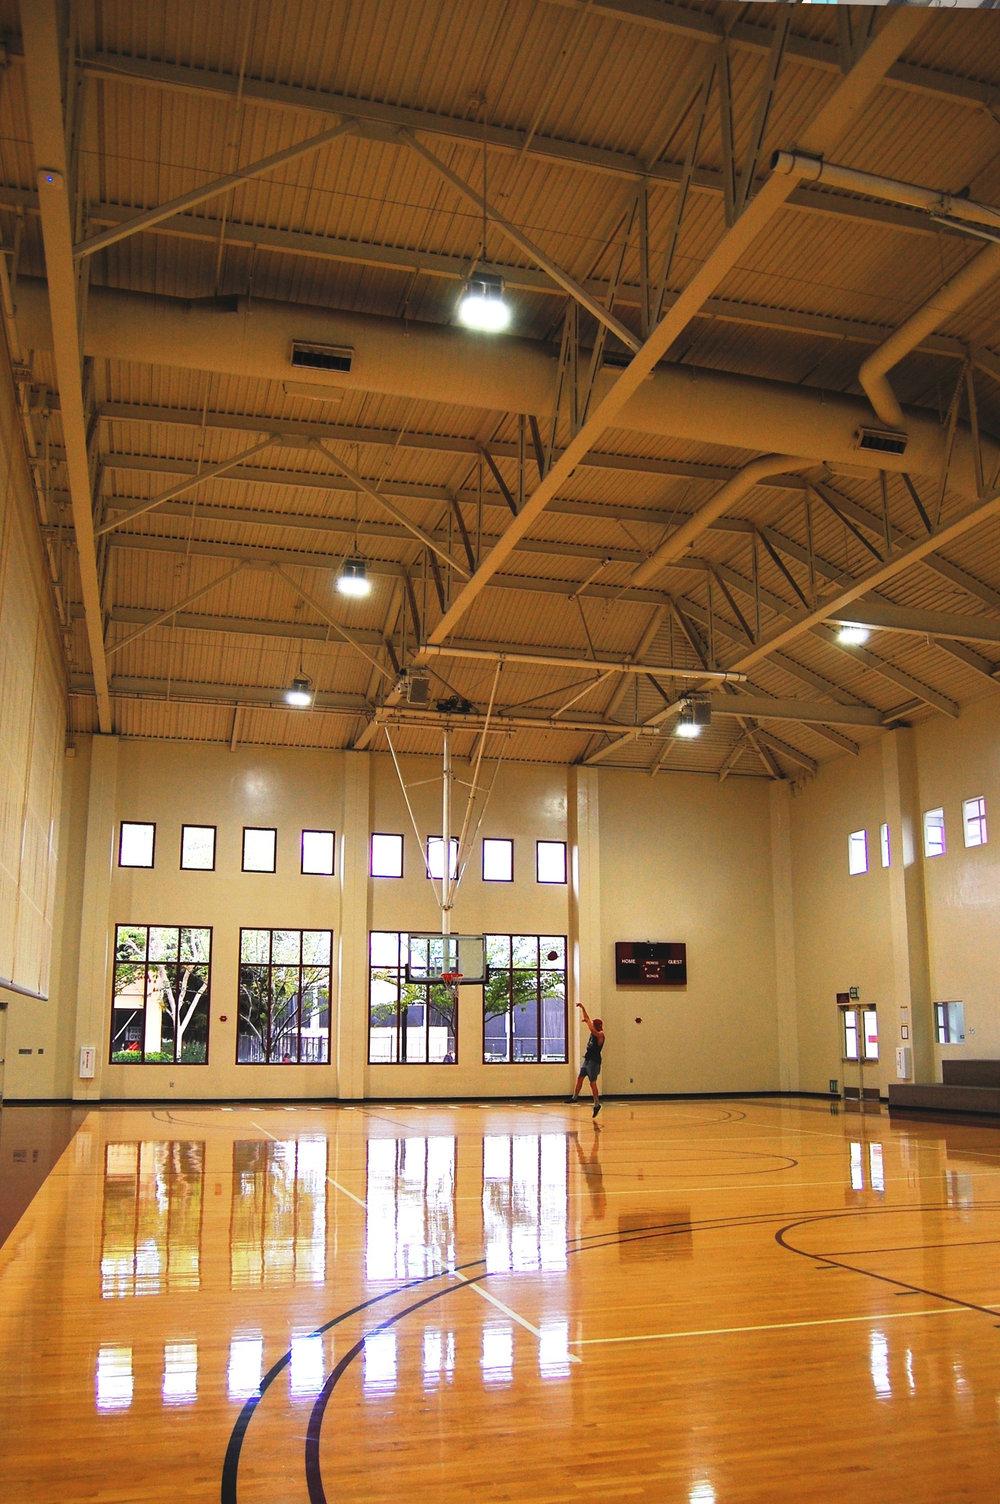 University Gym, CA